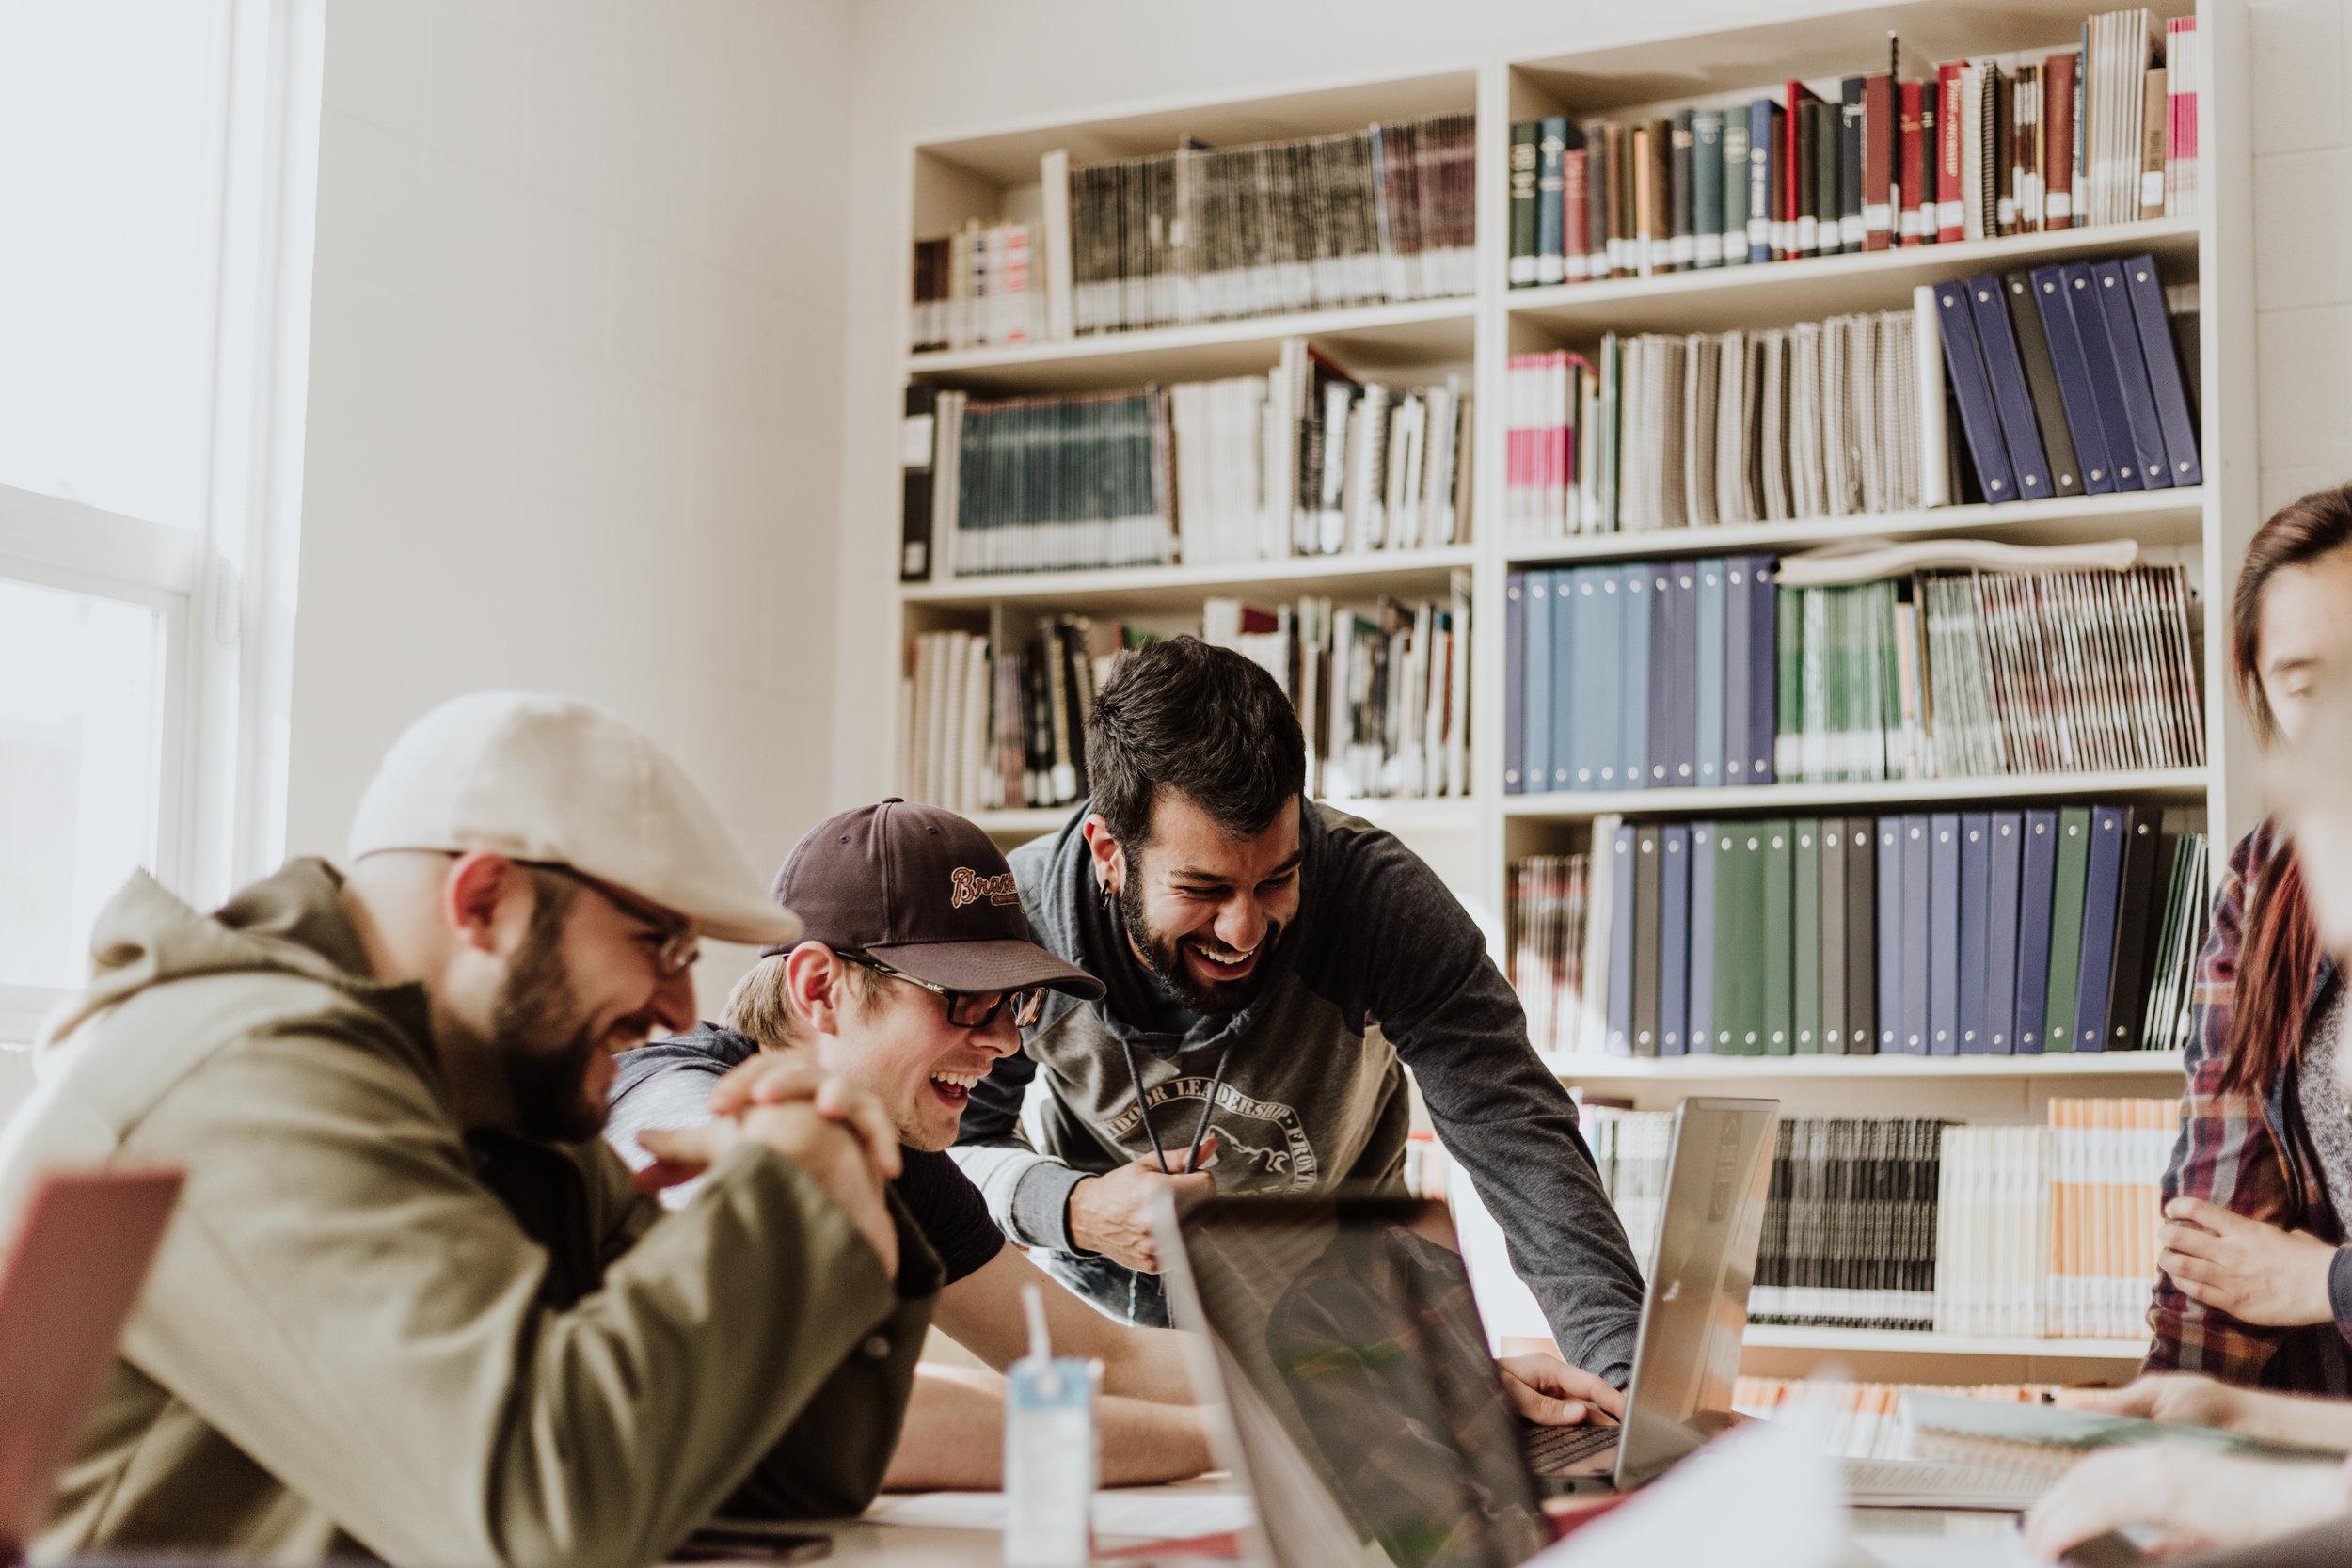 Graphium House Community - クリエイティブのプロとは職業や肩書きではなく、抽象概念を具体化させていく人たち